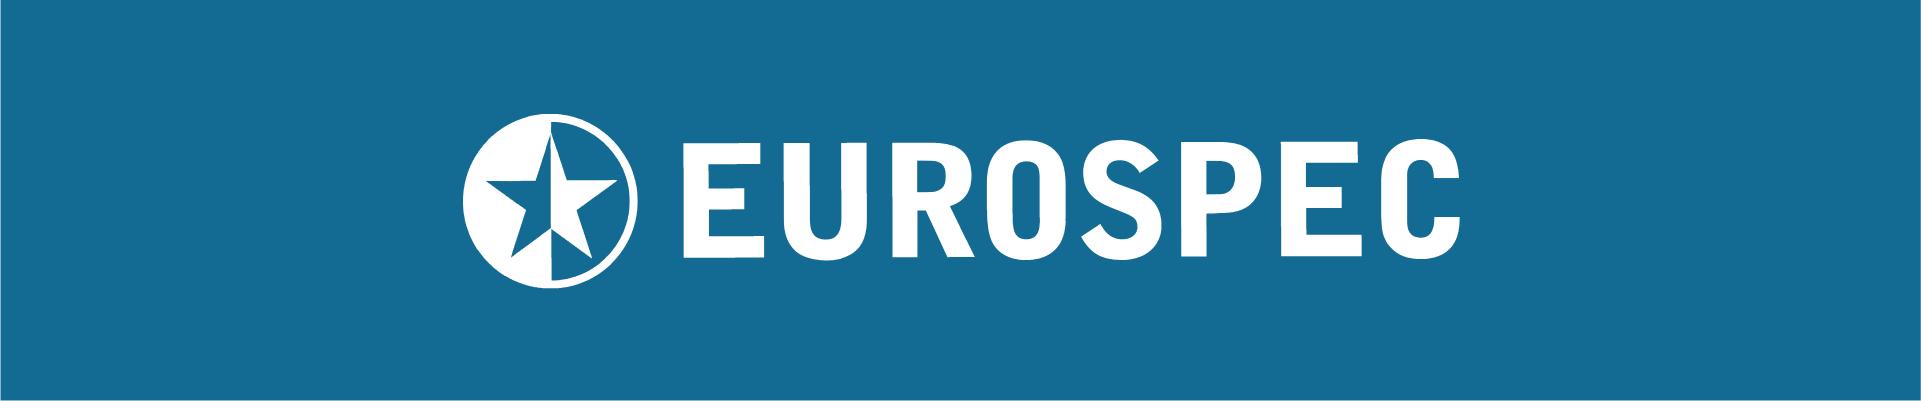 Eurospec